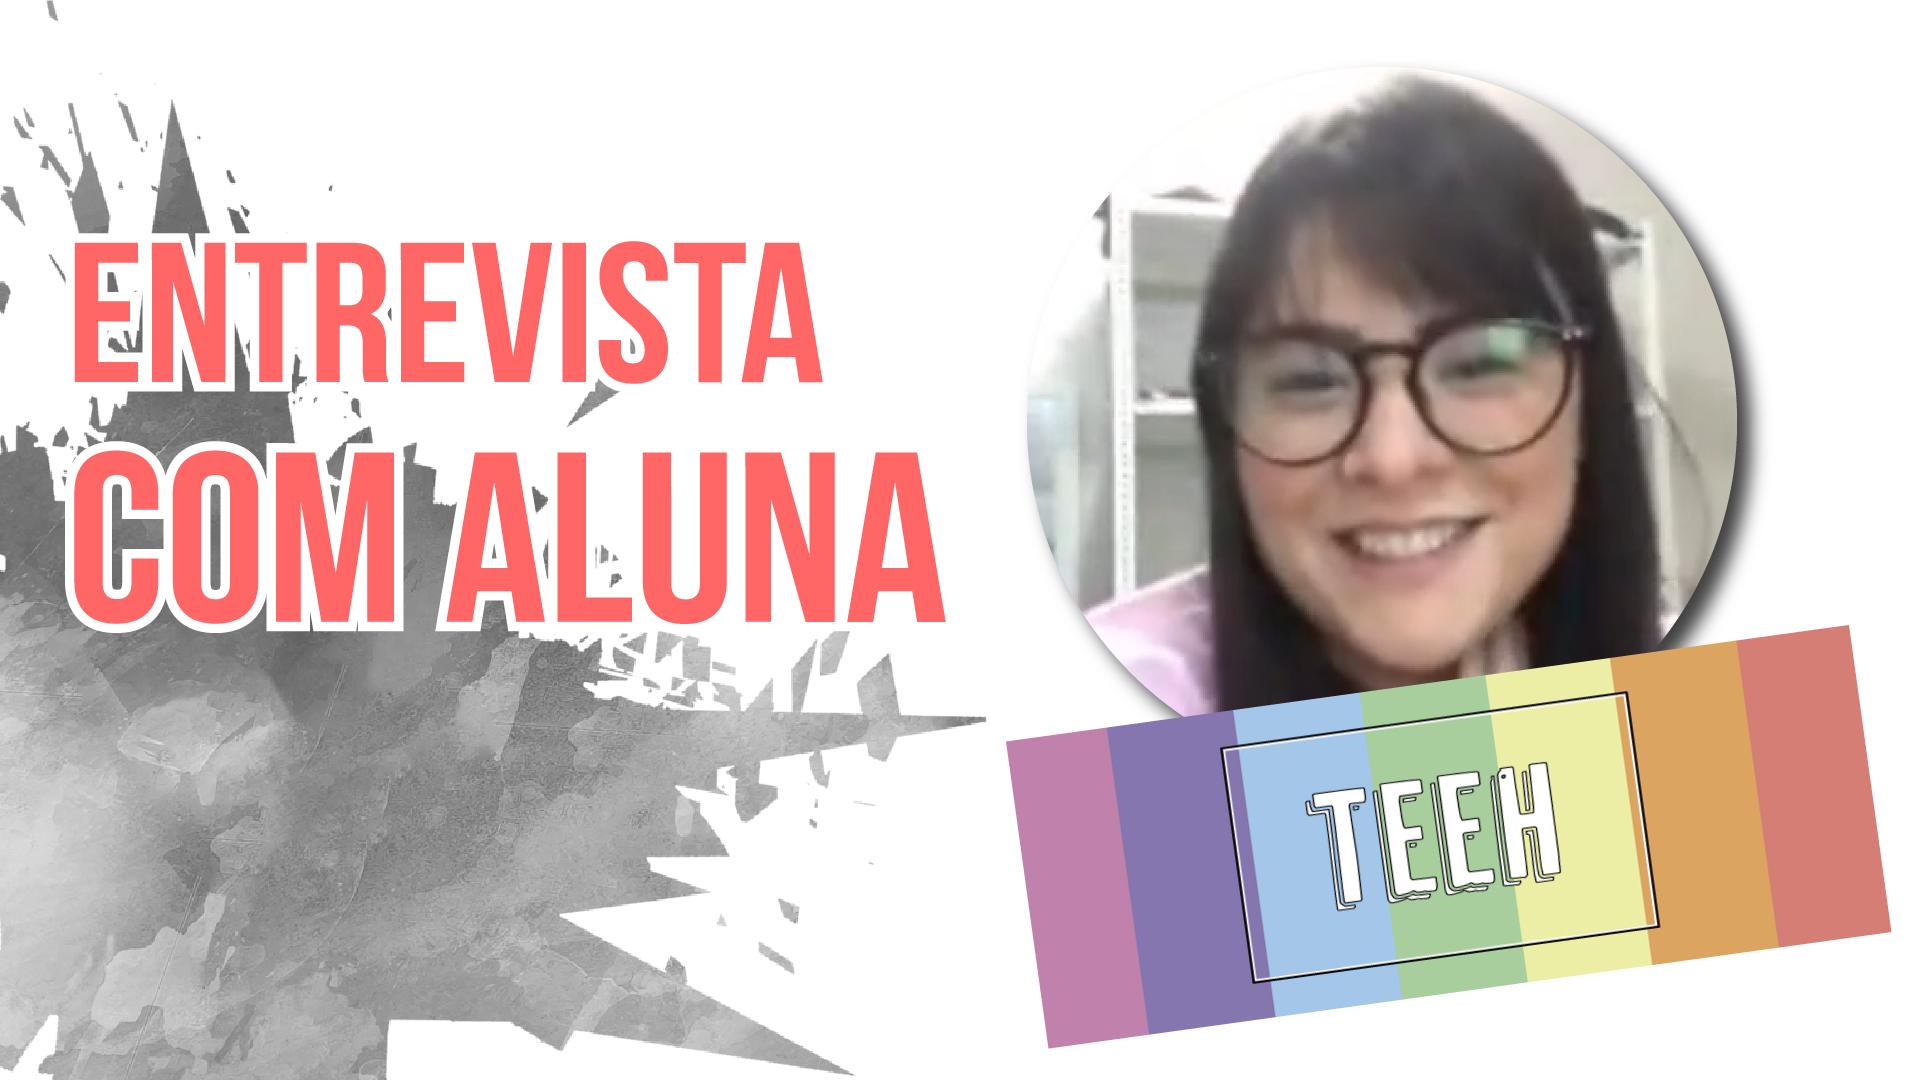 Entrevista com Tati Menezes da Teeh Shirts